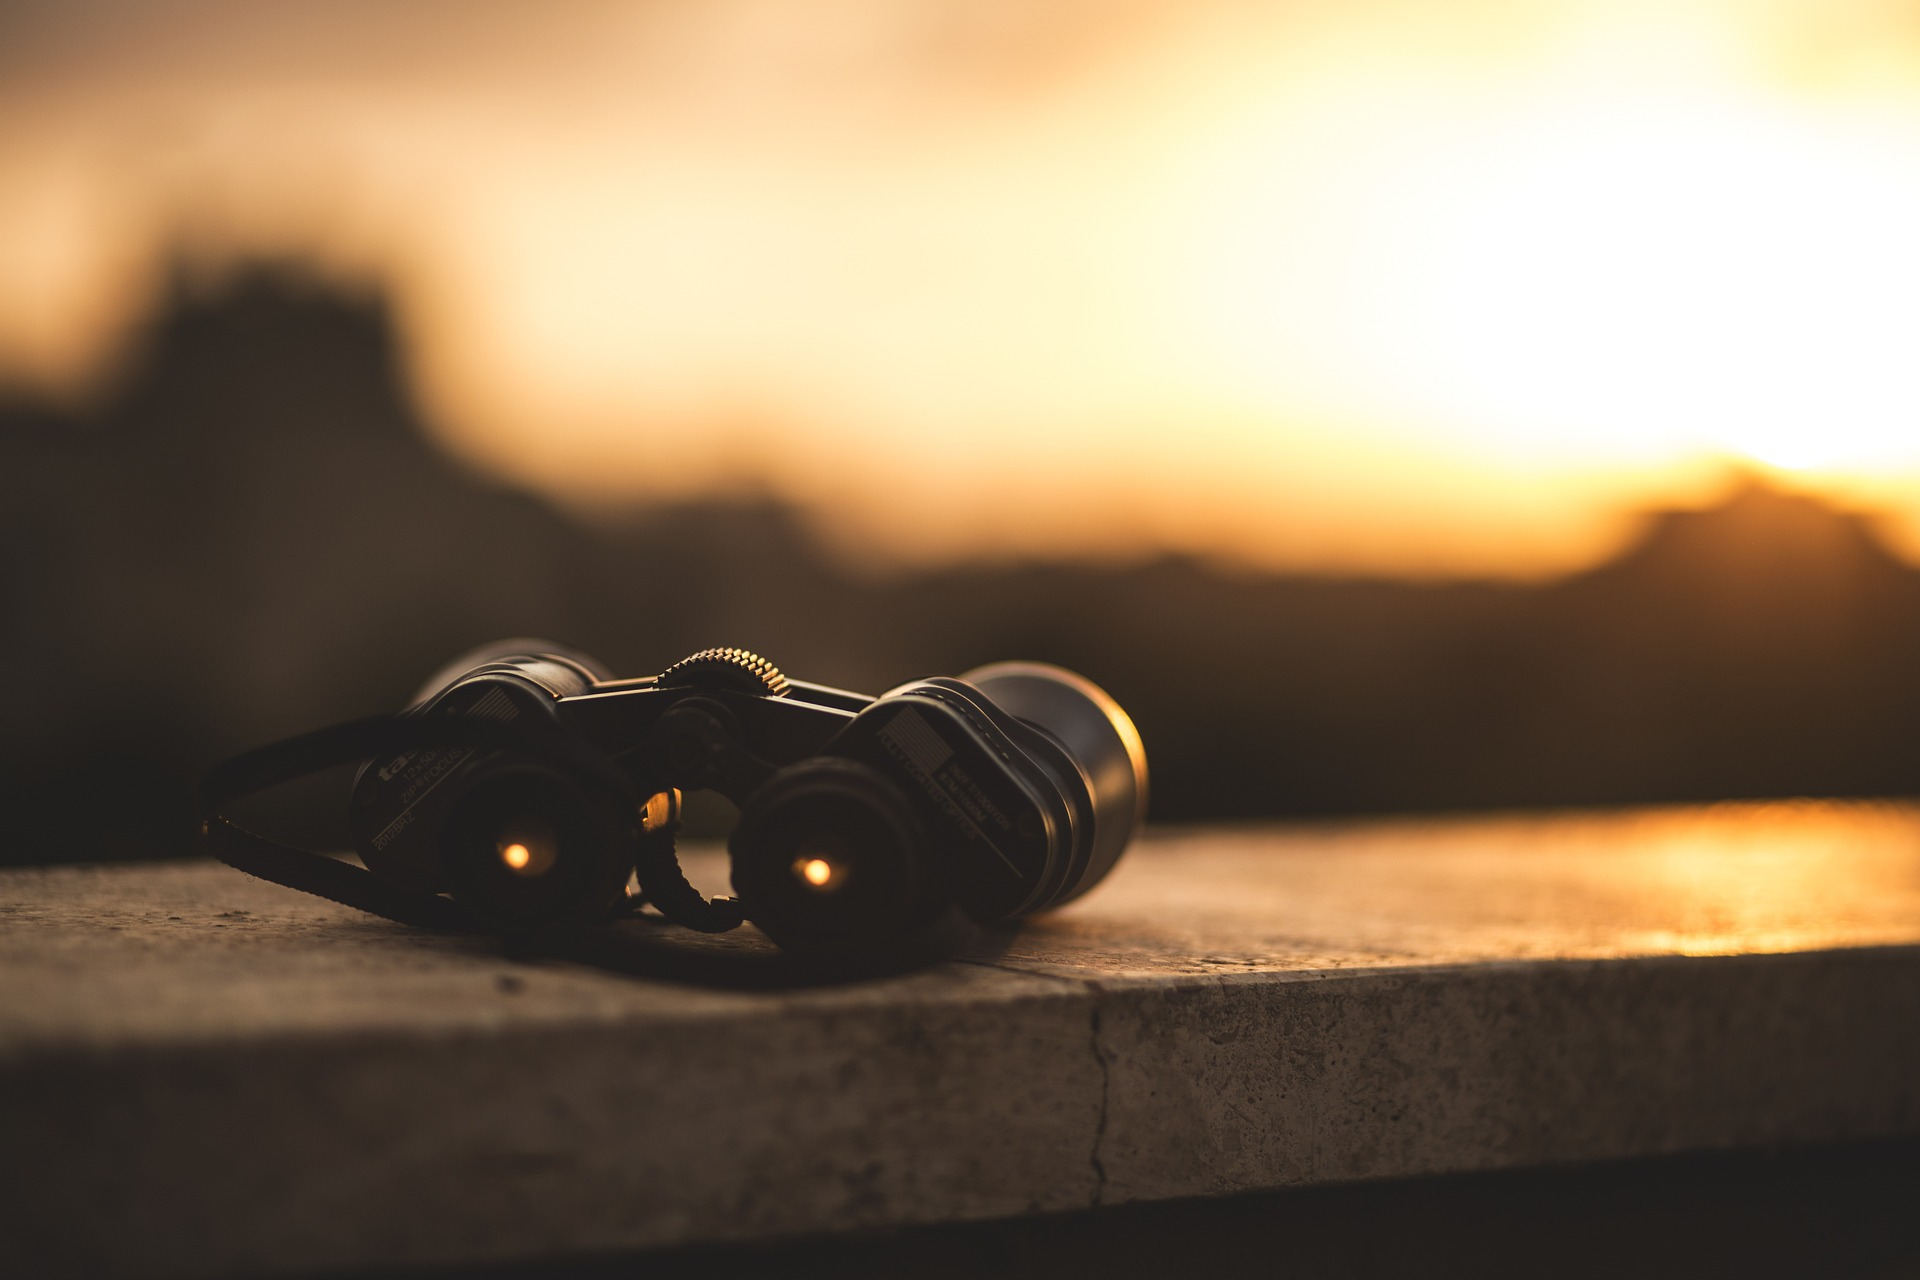 Fokus Fernglas Klarheit pixabay